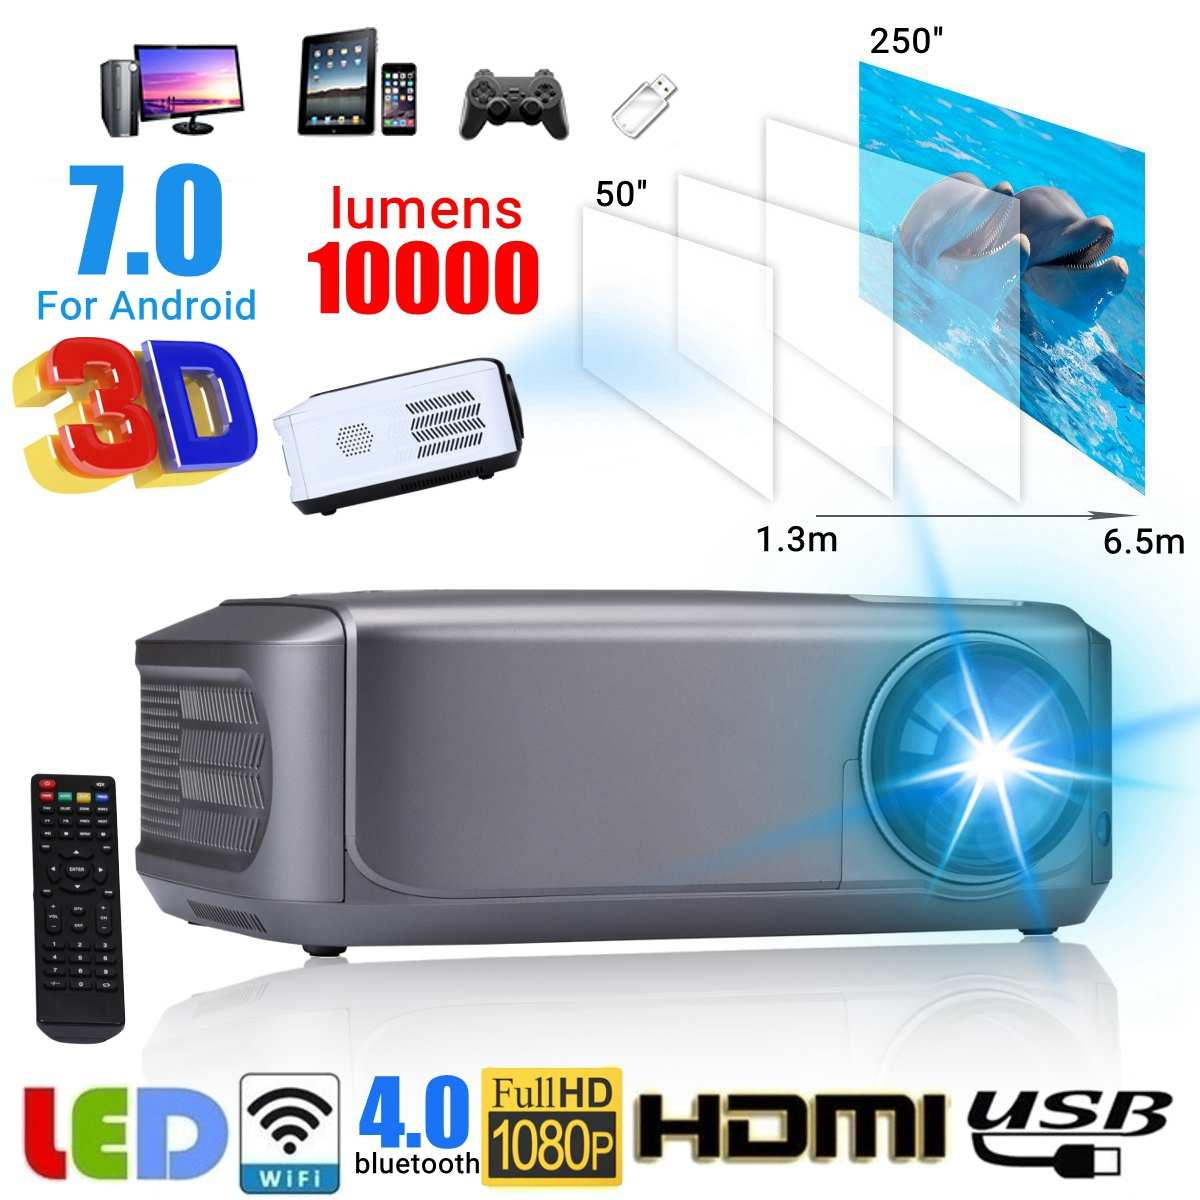 EU Plug WIFI 1080P HD Mini Projector 10000 lumens Proyector Remote Control LED Portable HD Beamer for Home CinemaEU Plug WIFI 1080P HD Mini Projector 10000 lumens Proyector Remote Control LED Portable HD Beamer for Home Cinema